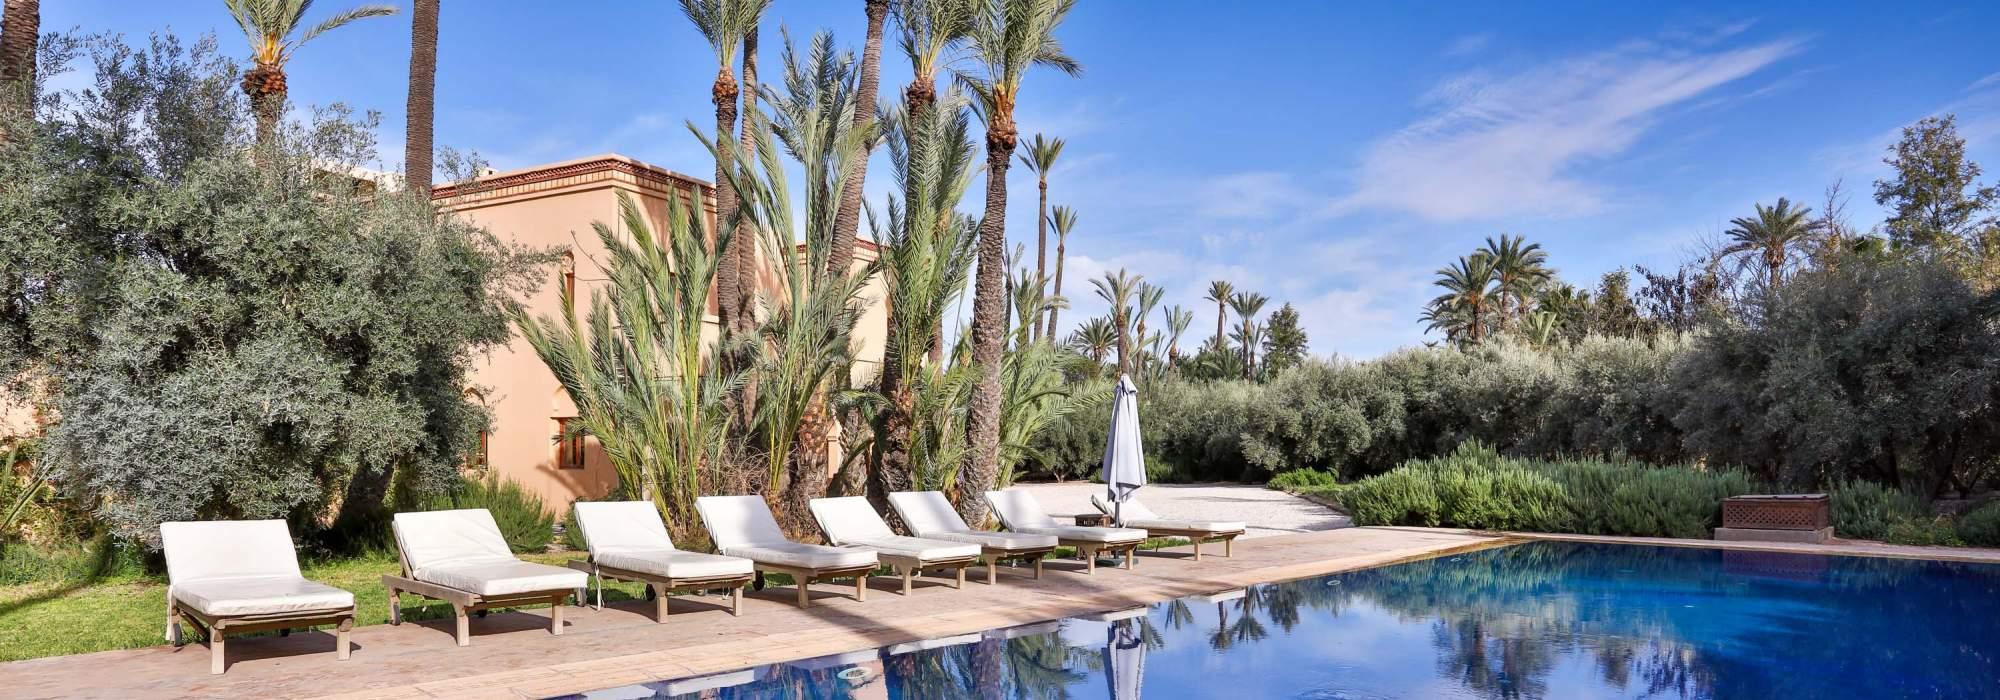 villa de luxe a vendre palmeraie marrakech